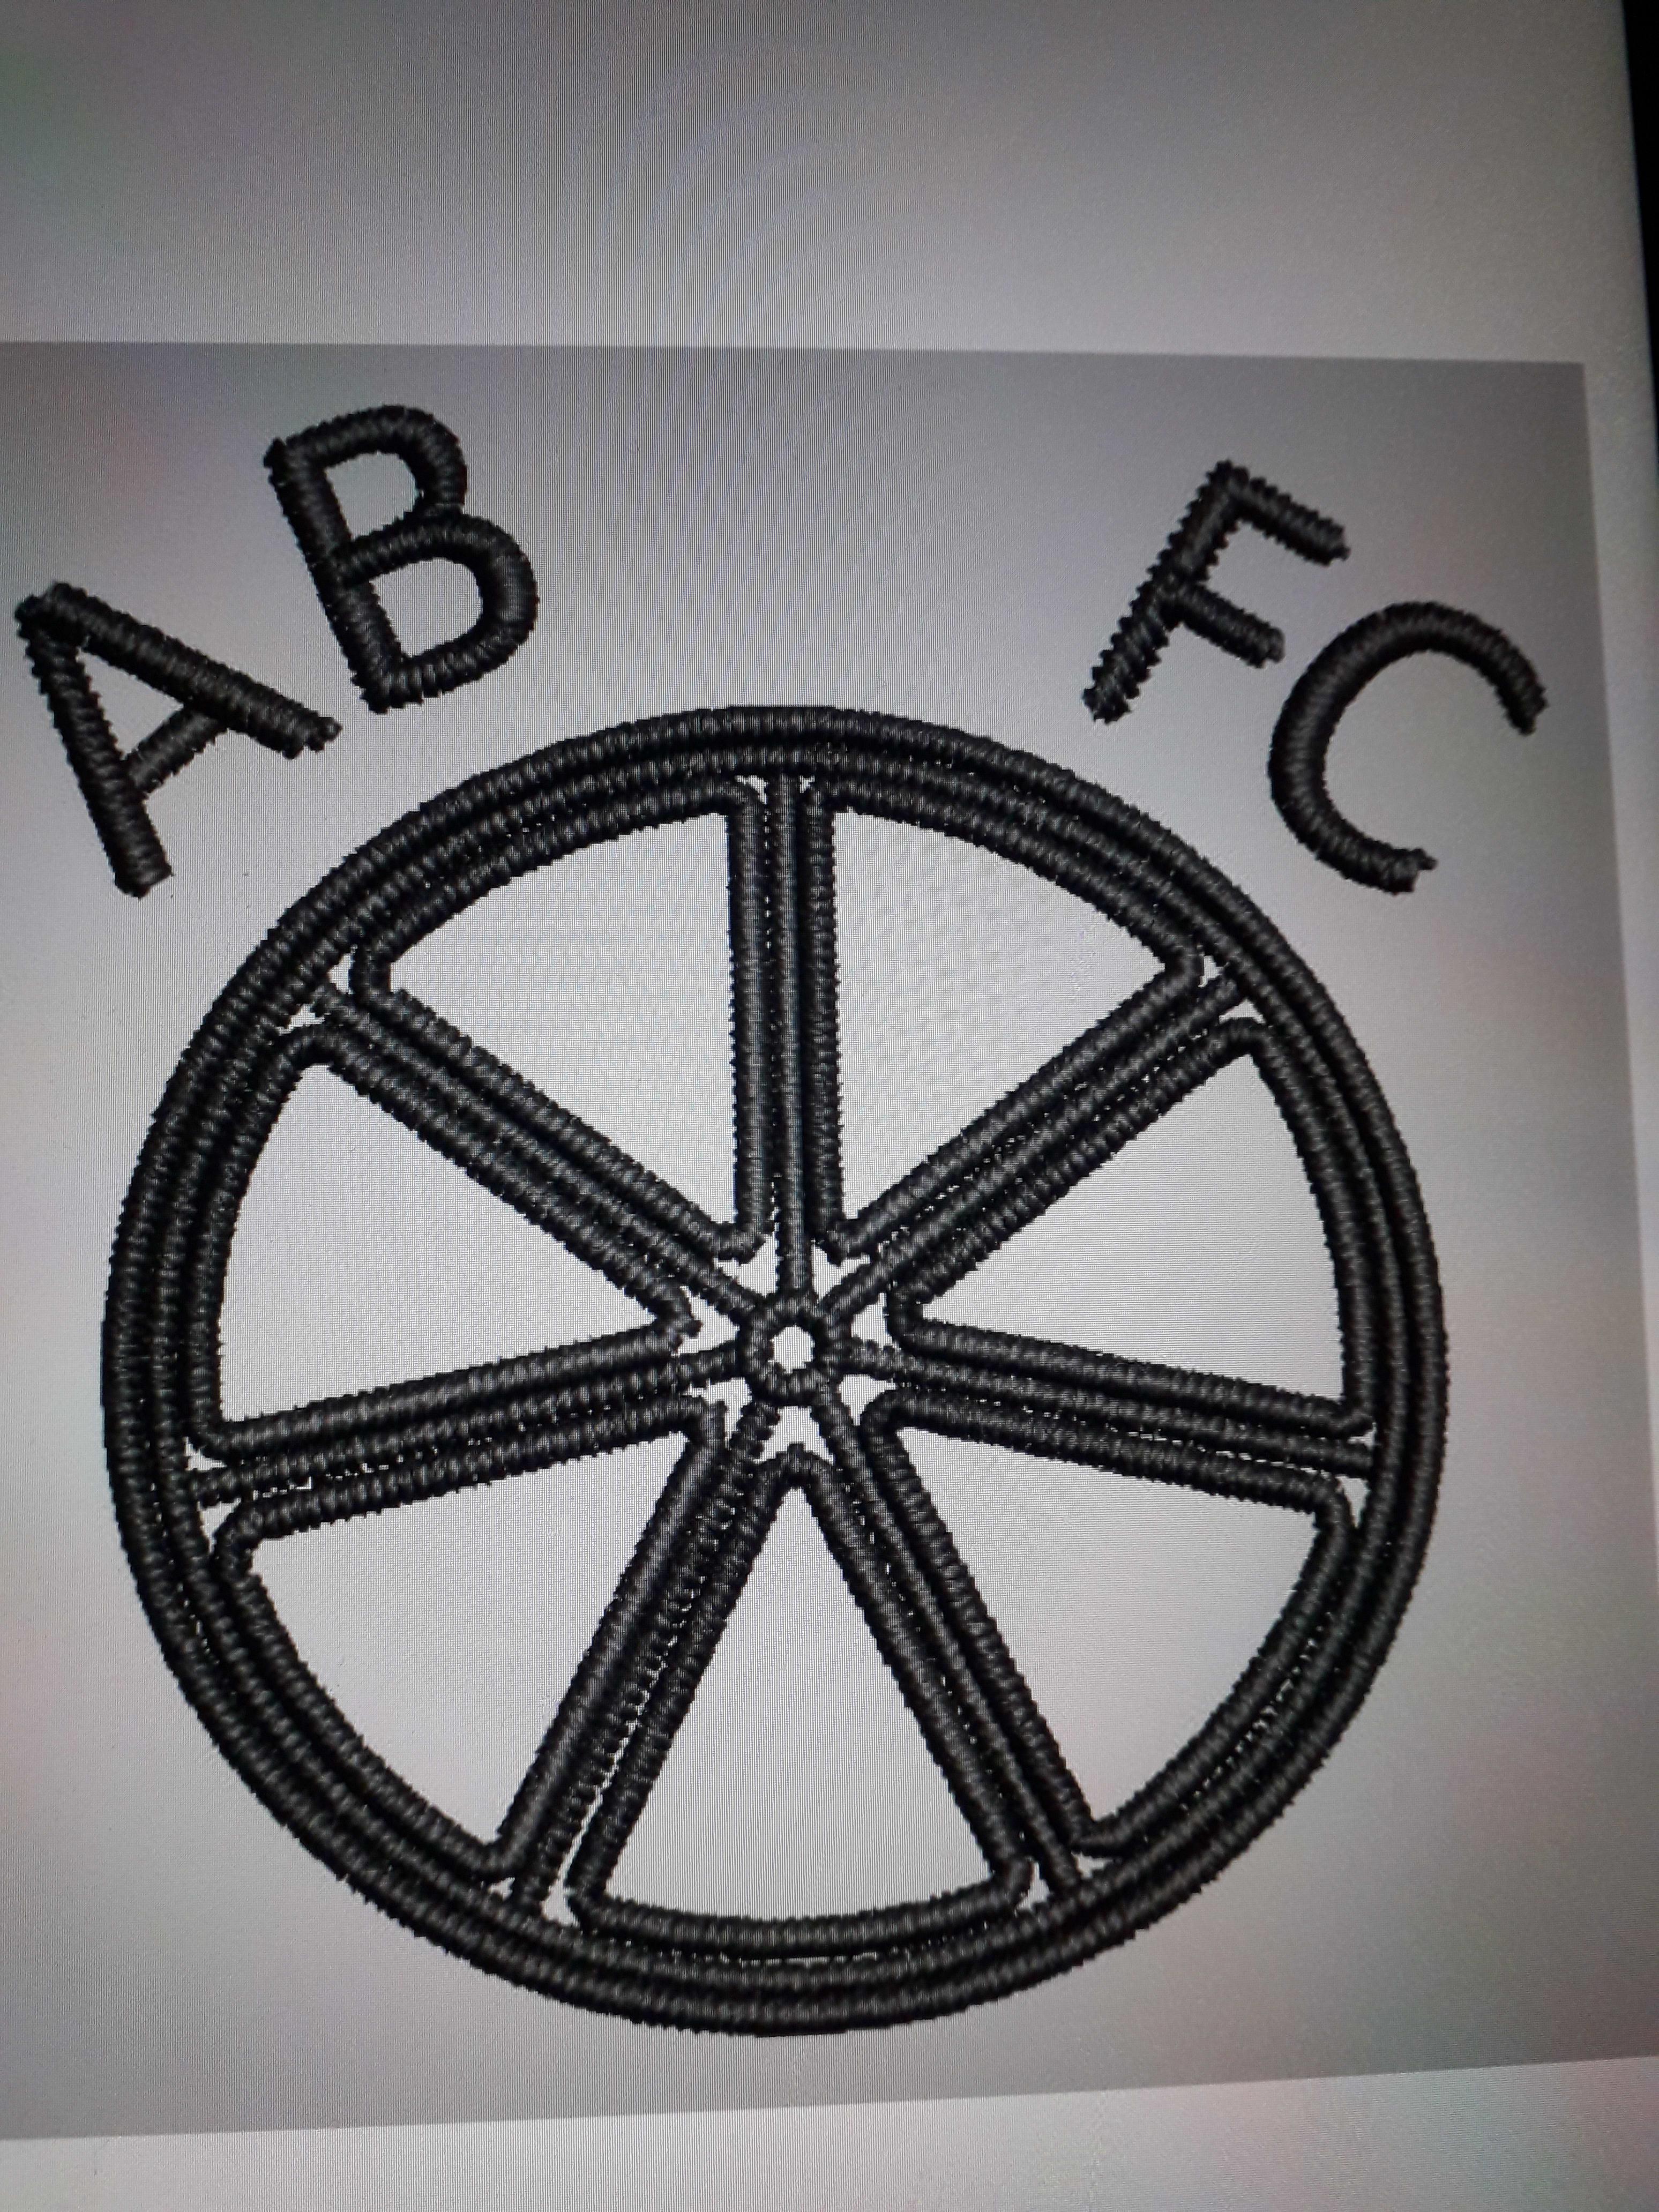 AB FC  U11s (Allerton bywater fc)